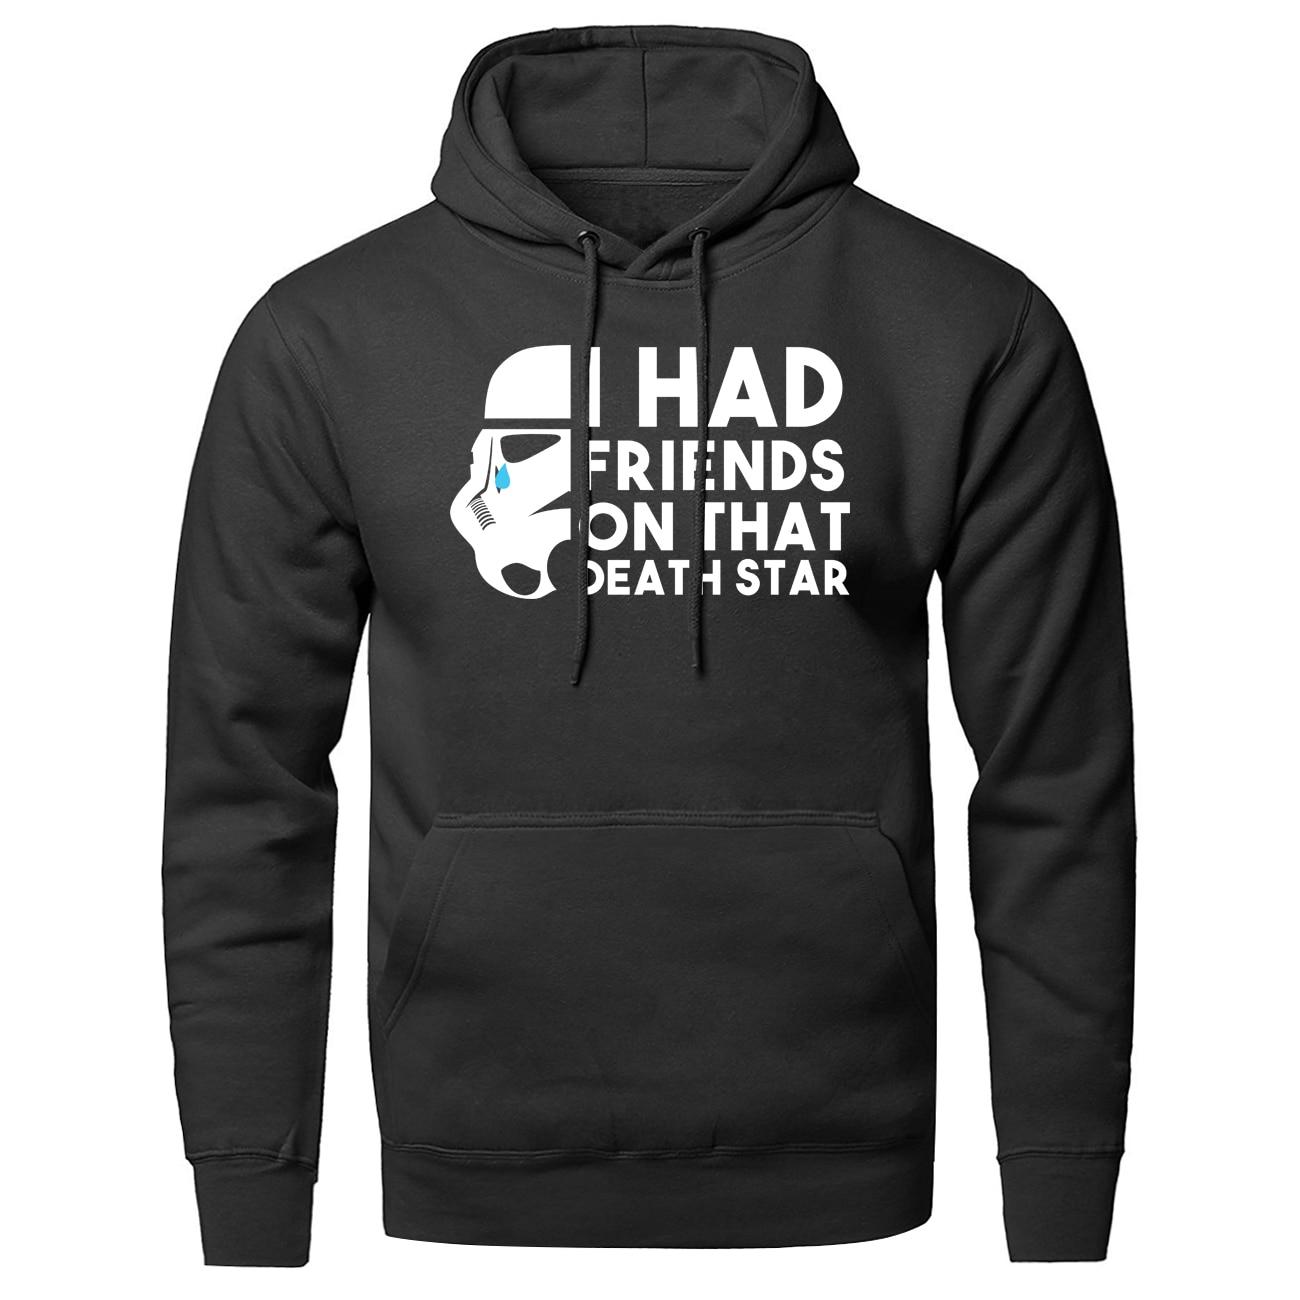 2020 Men Wars Print Hooded Hoodie I Had Friends On That Death Star Pattern Fashion Fleece Outwear Sweatshirt Spring Autumn Coats